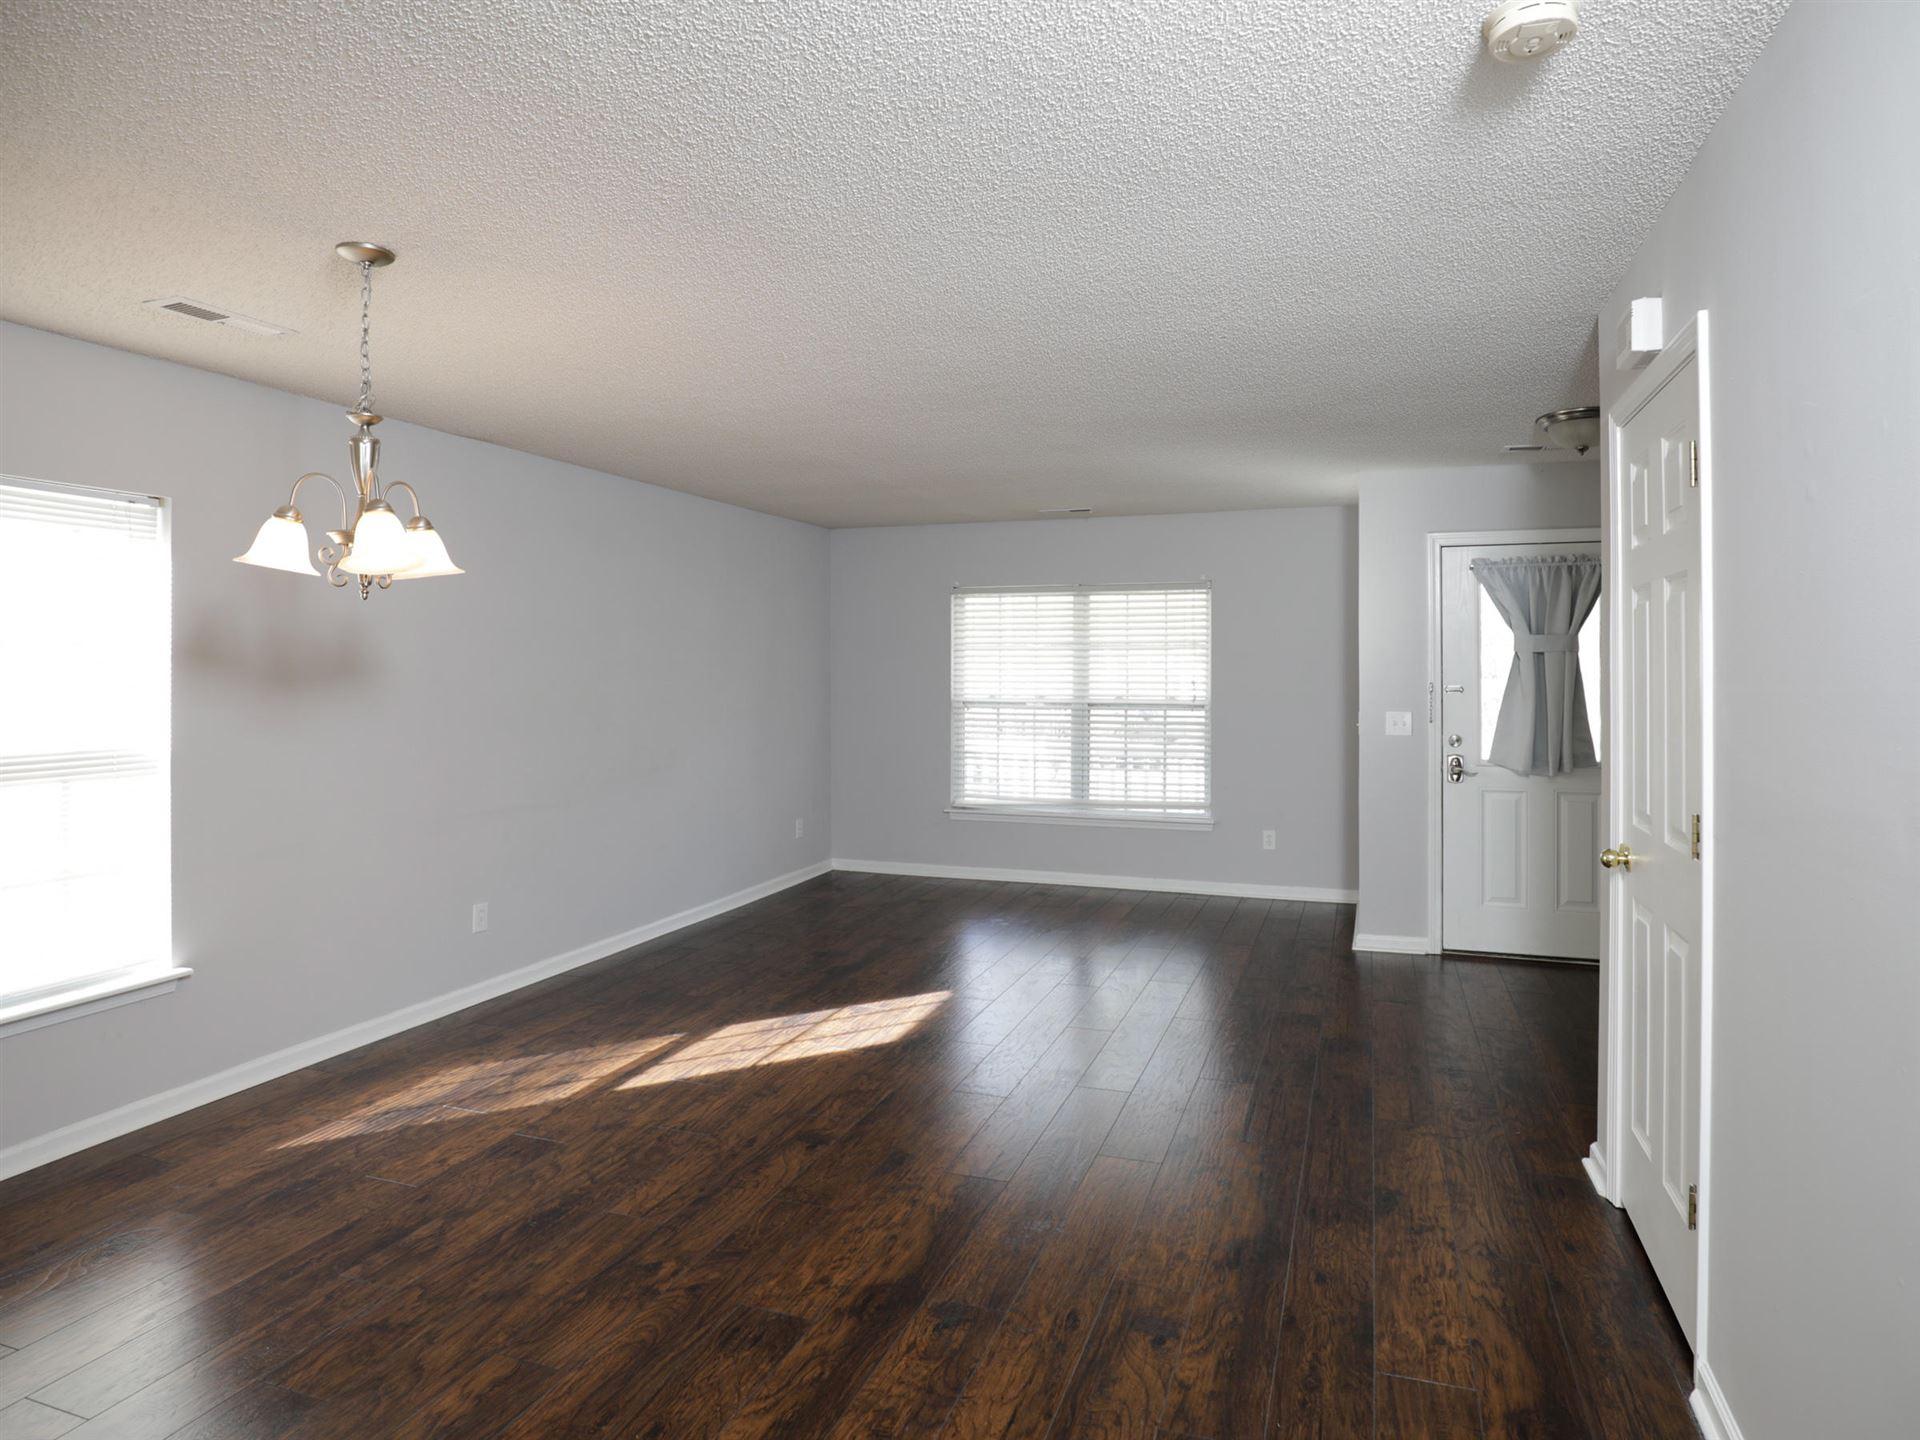 Photo of 5005 Wigmore Street, Summerville, SC 29485 (MLS # 21005370)